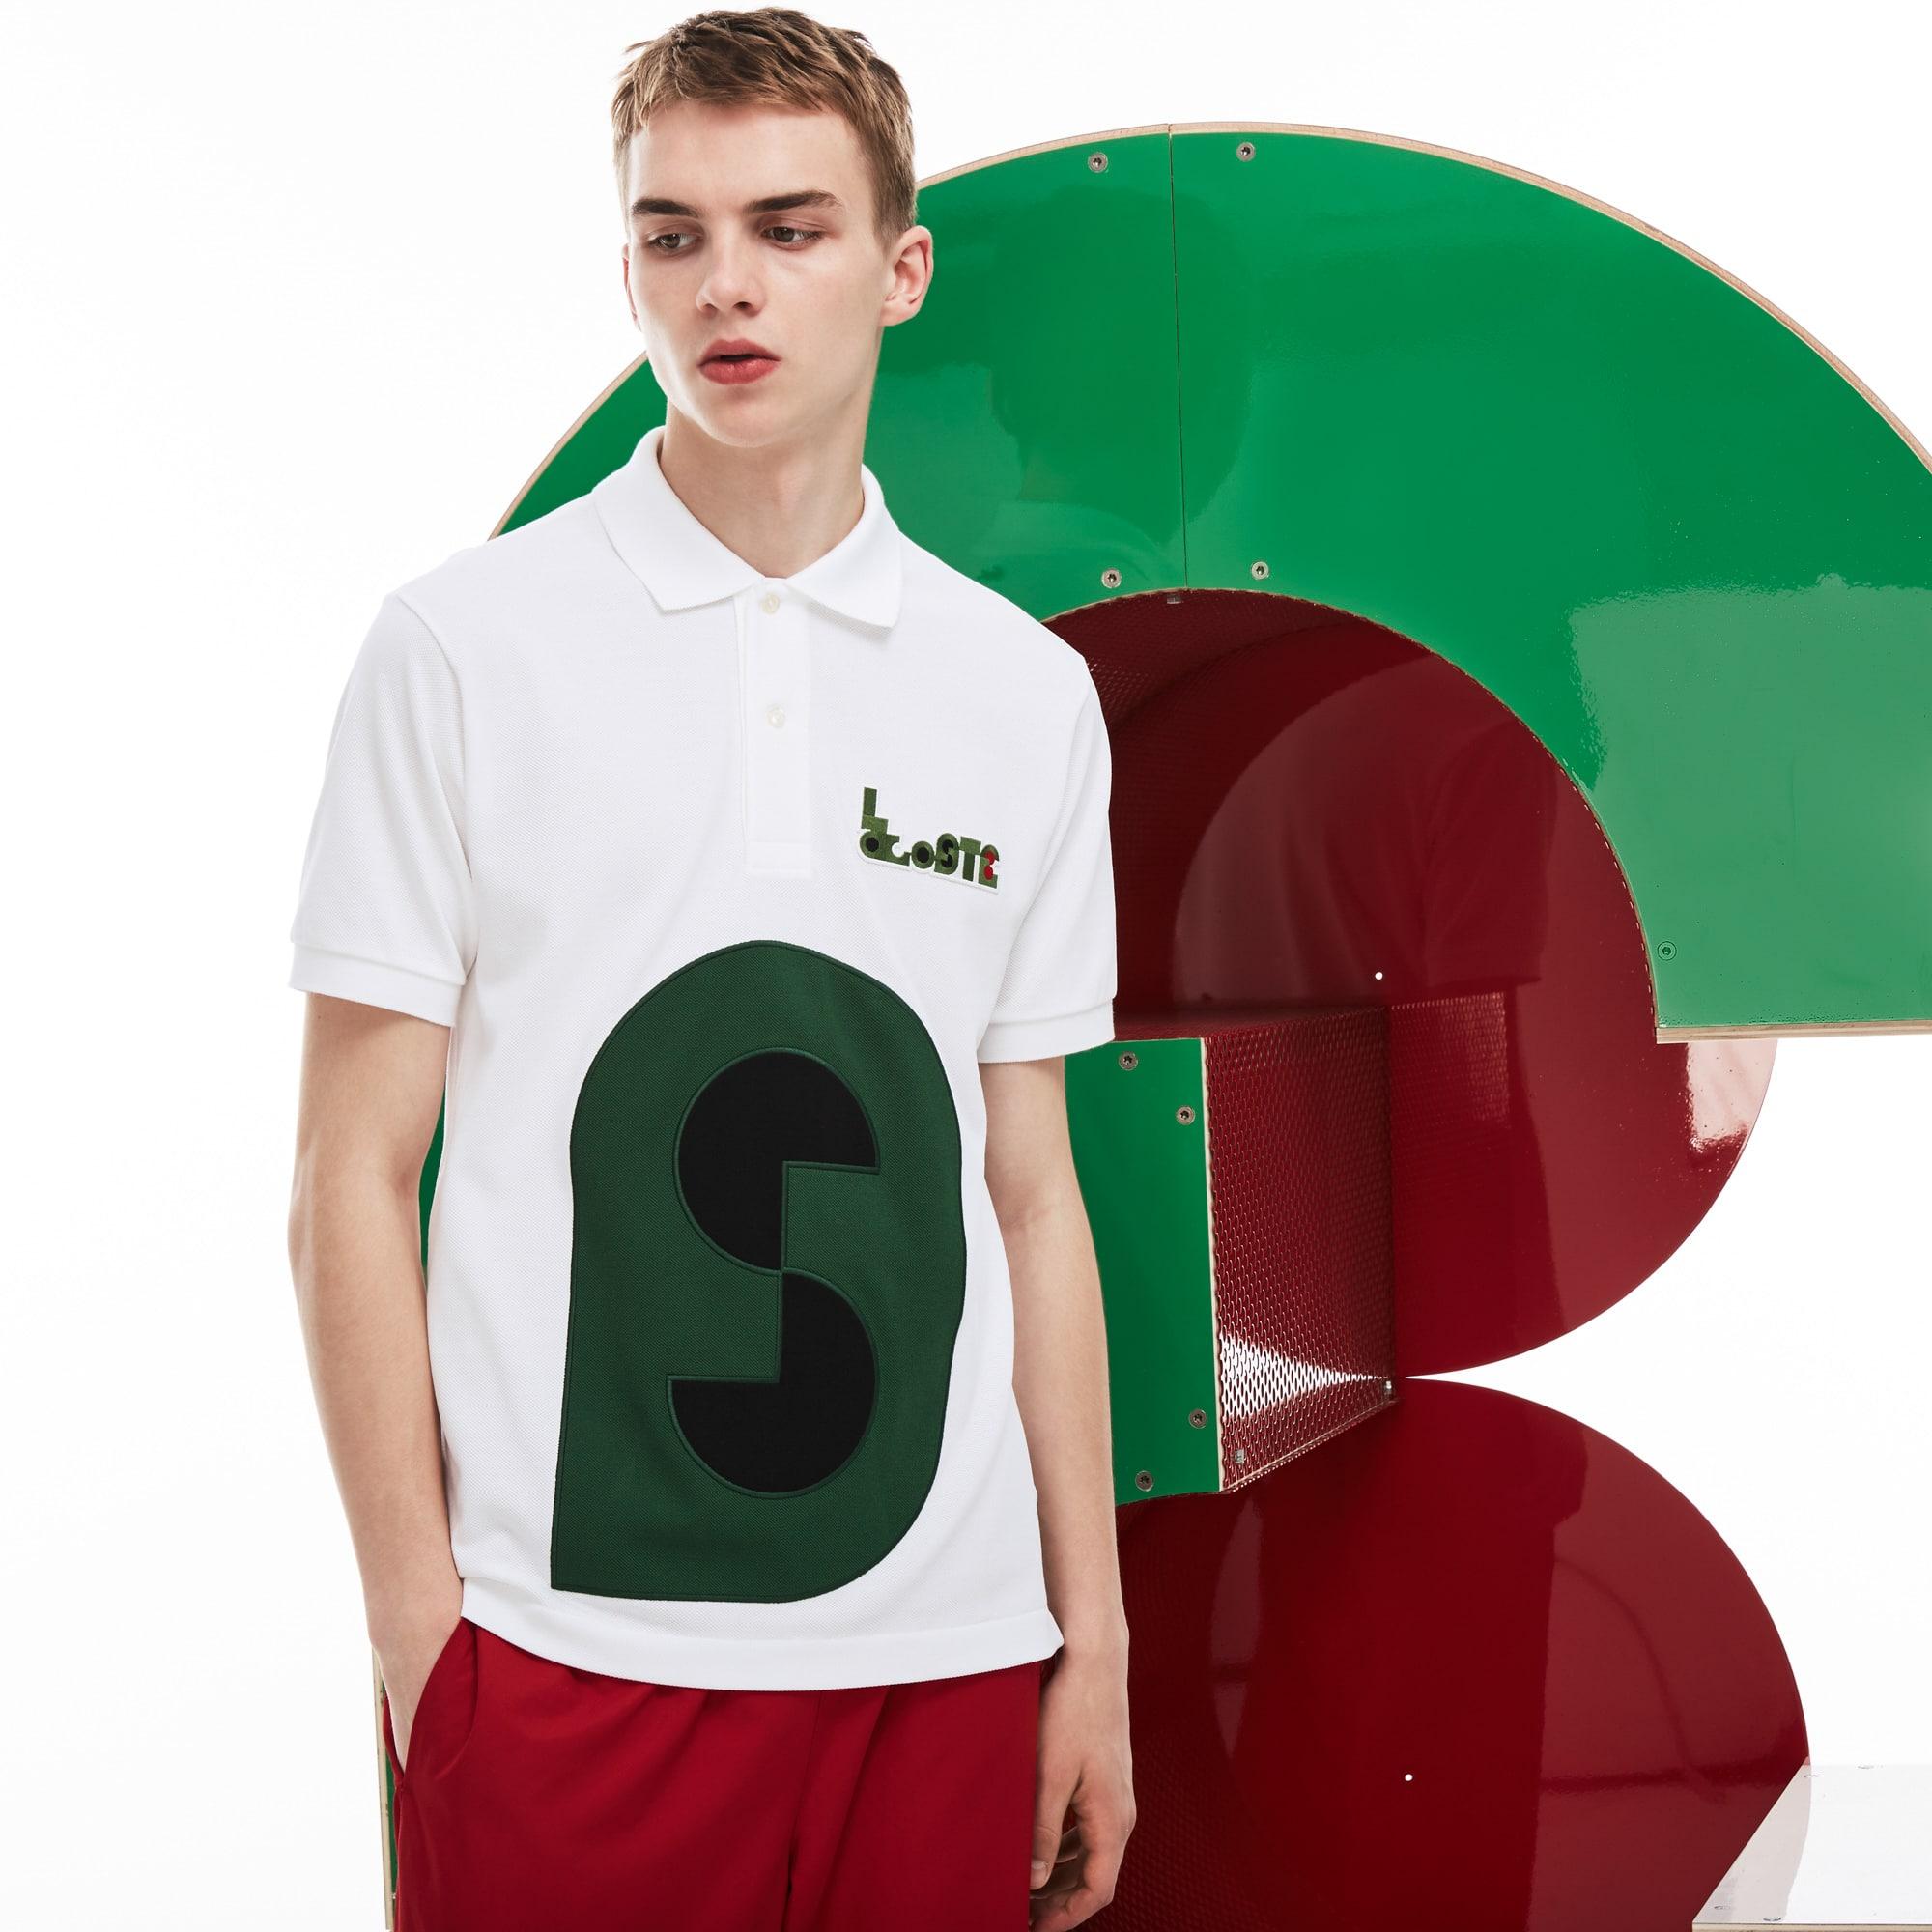 Herren-Poloshirt MM COLLAB L.12.12 aus dickem Baumwoll-Piqué